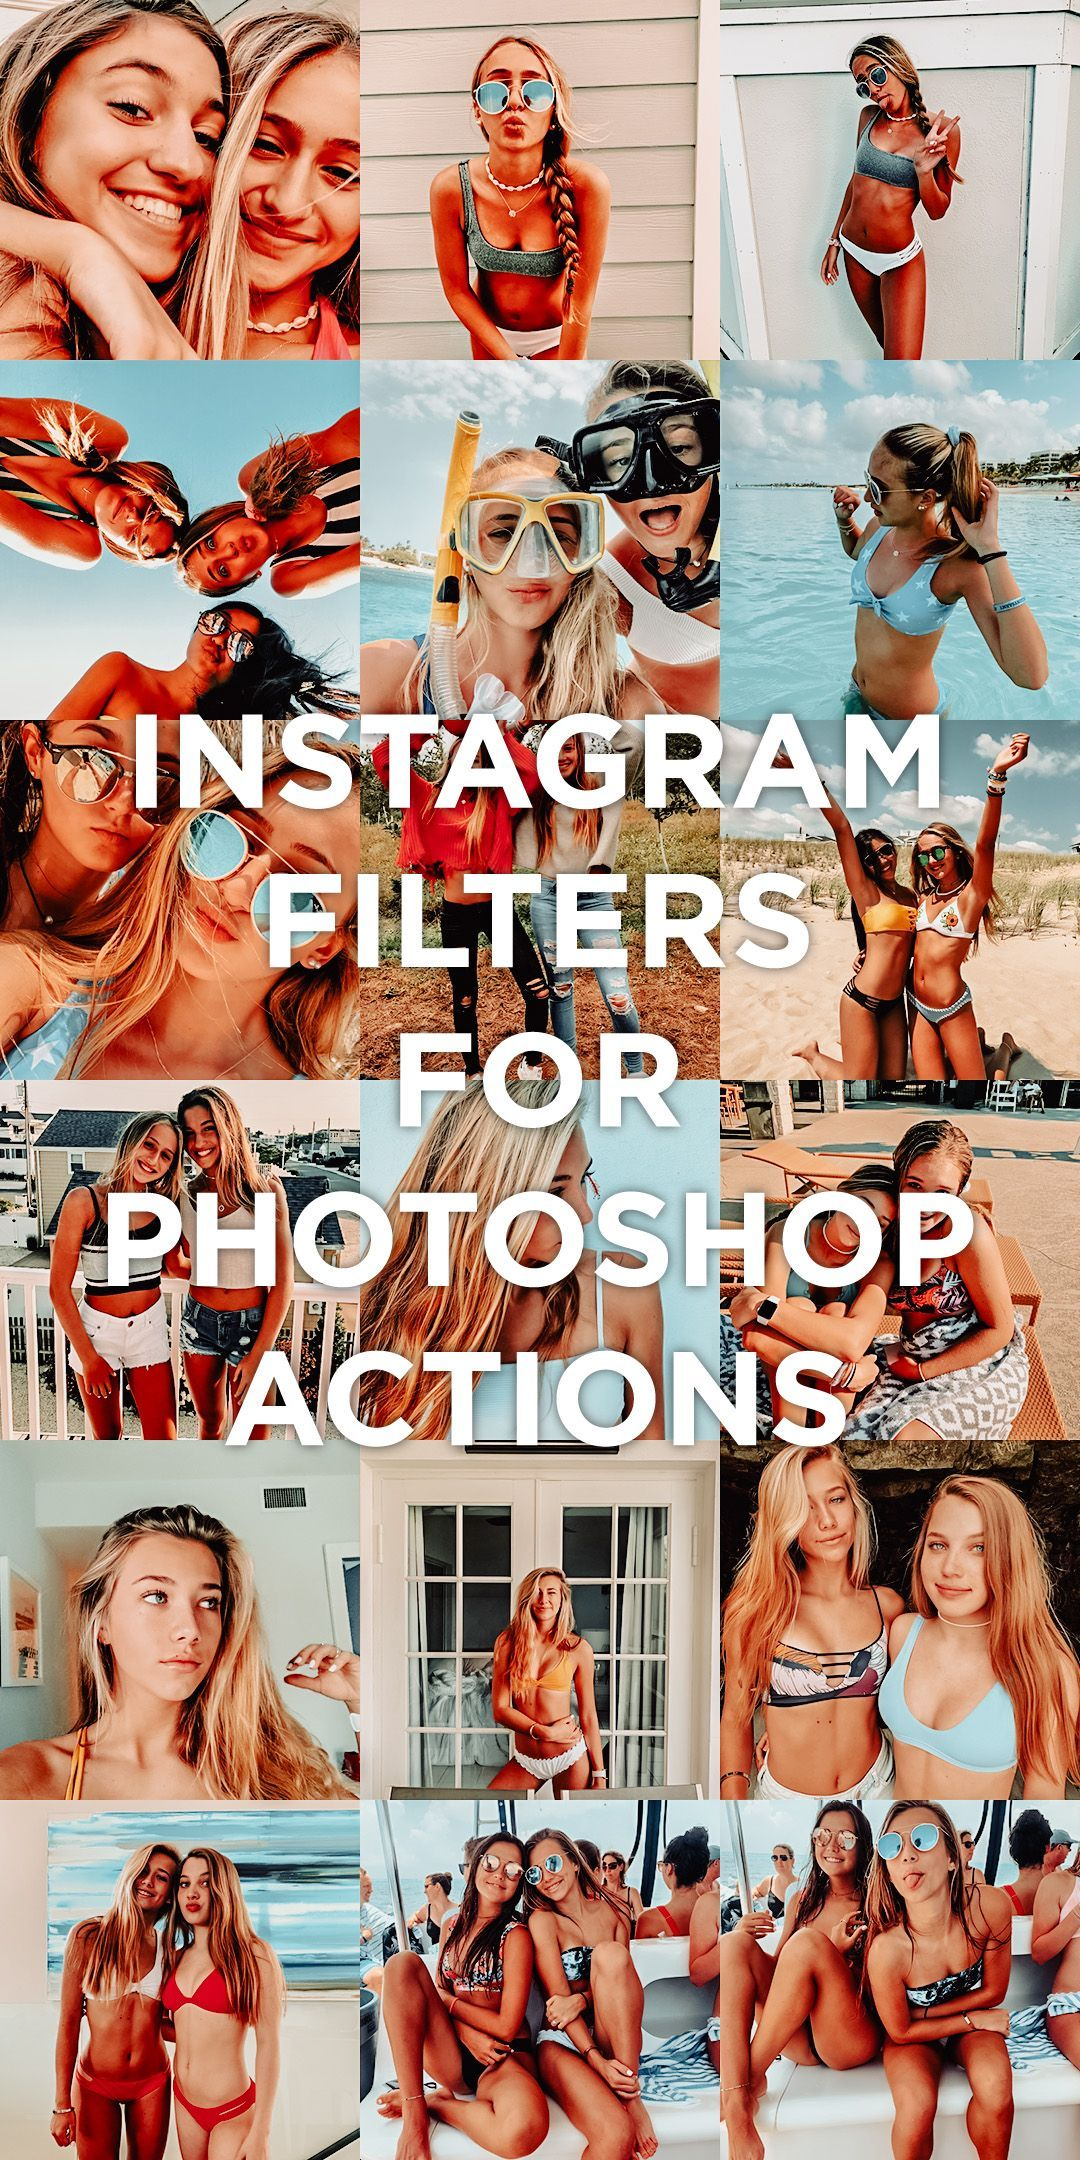 fitness instagram, vsco filter aesthetic, instagram quotes for selfies,  summe... - Instagram bio...